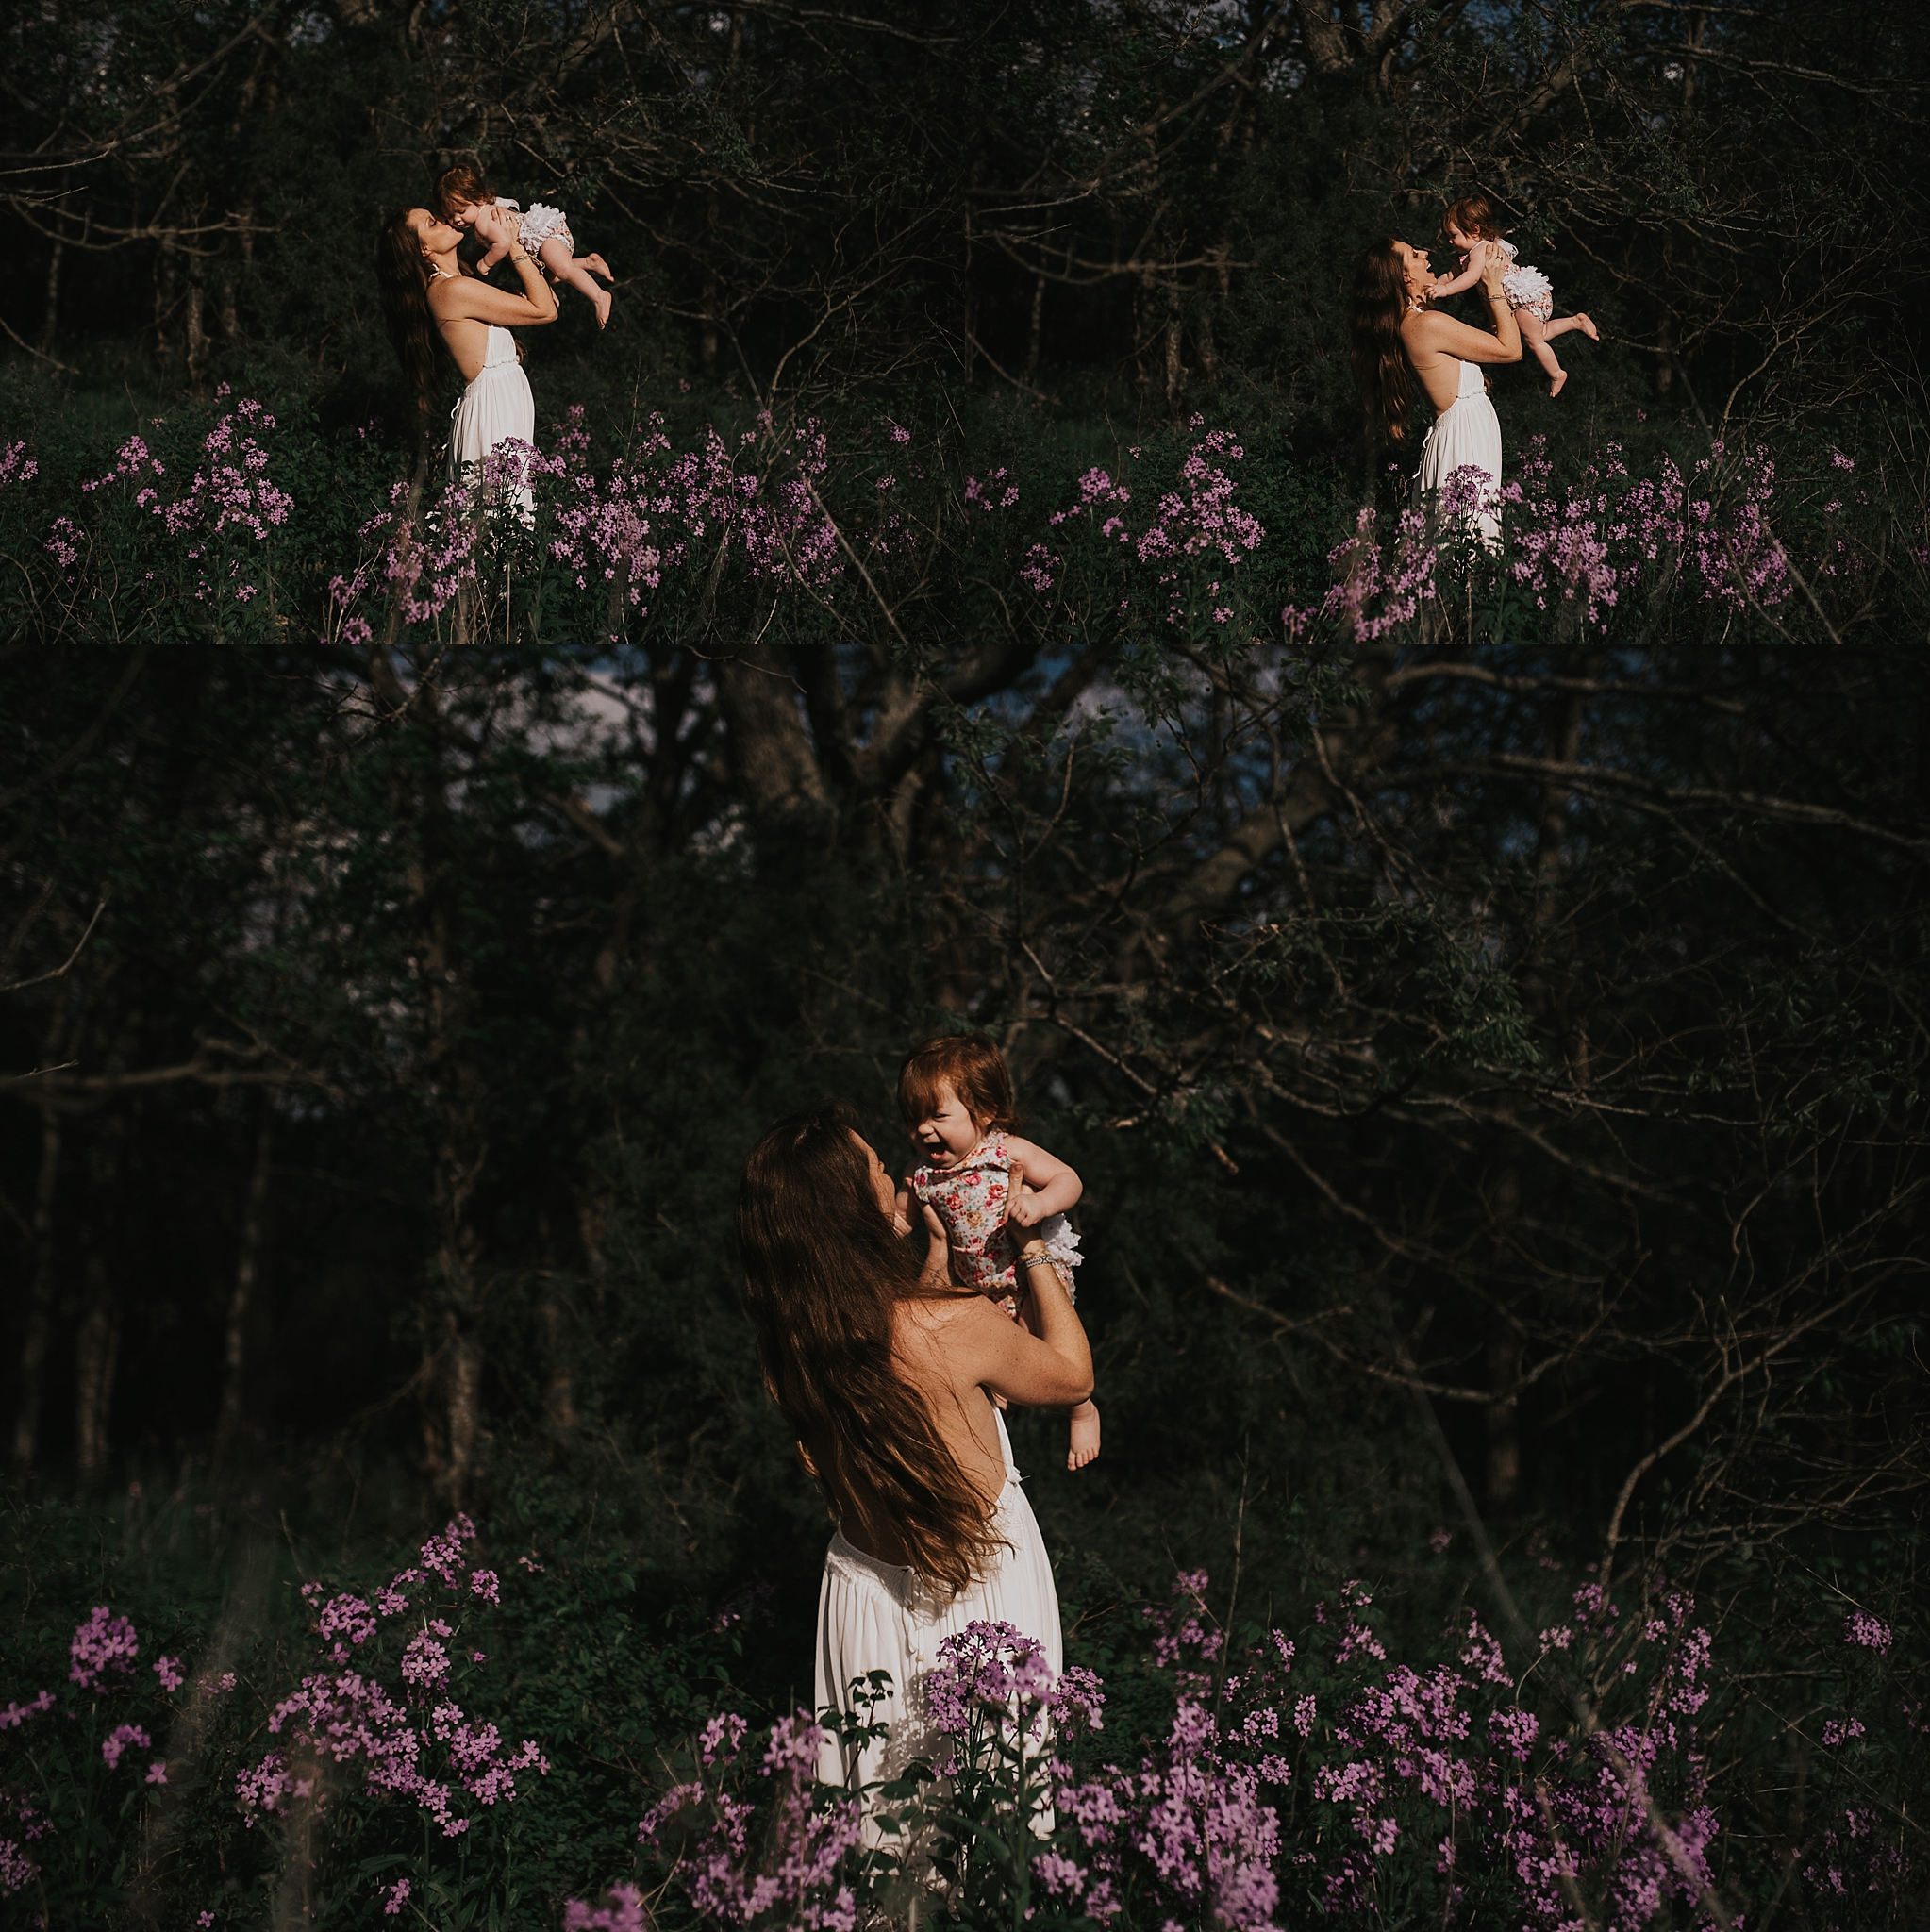 twyla jones photography - mother daughter - field and forest-4249_treasure coast florida.jpg